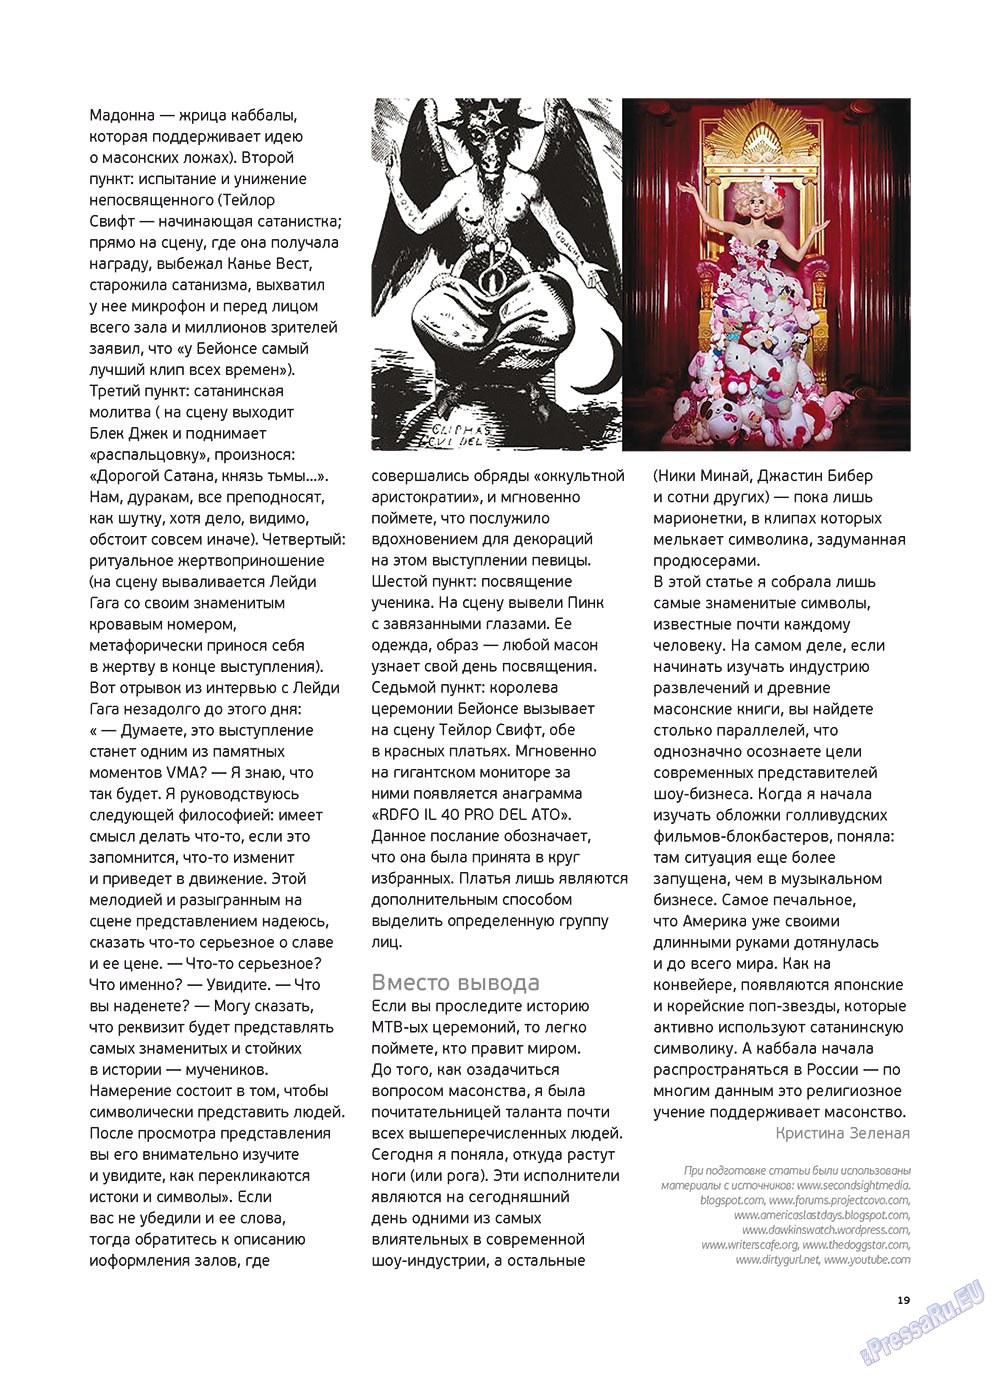 Артек (журнал). 2011 год, номер 4, стр. 21